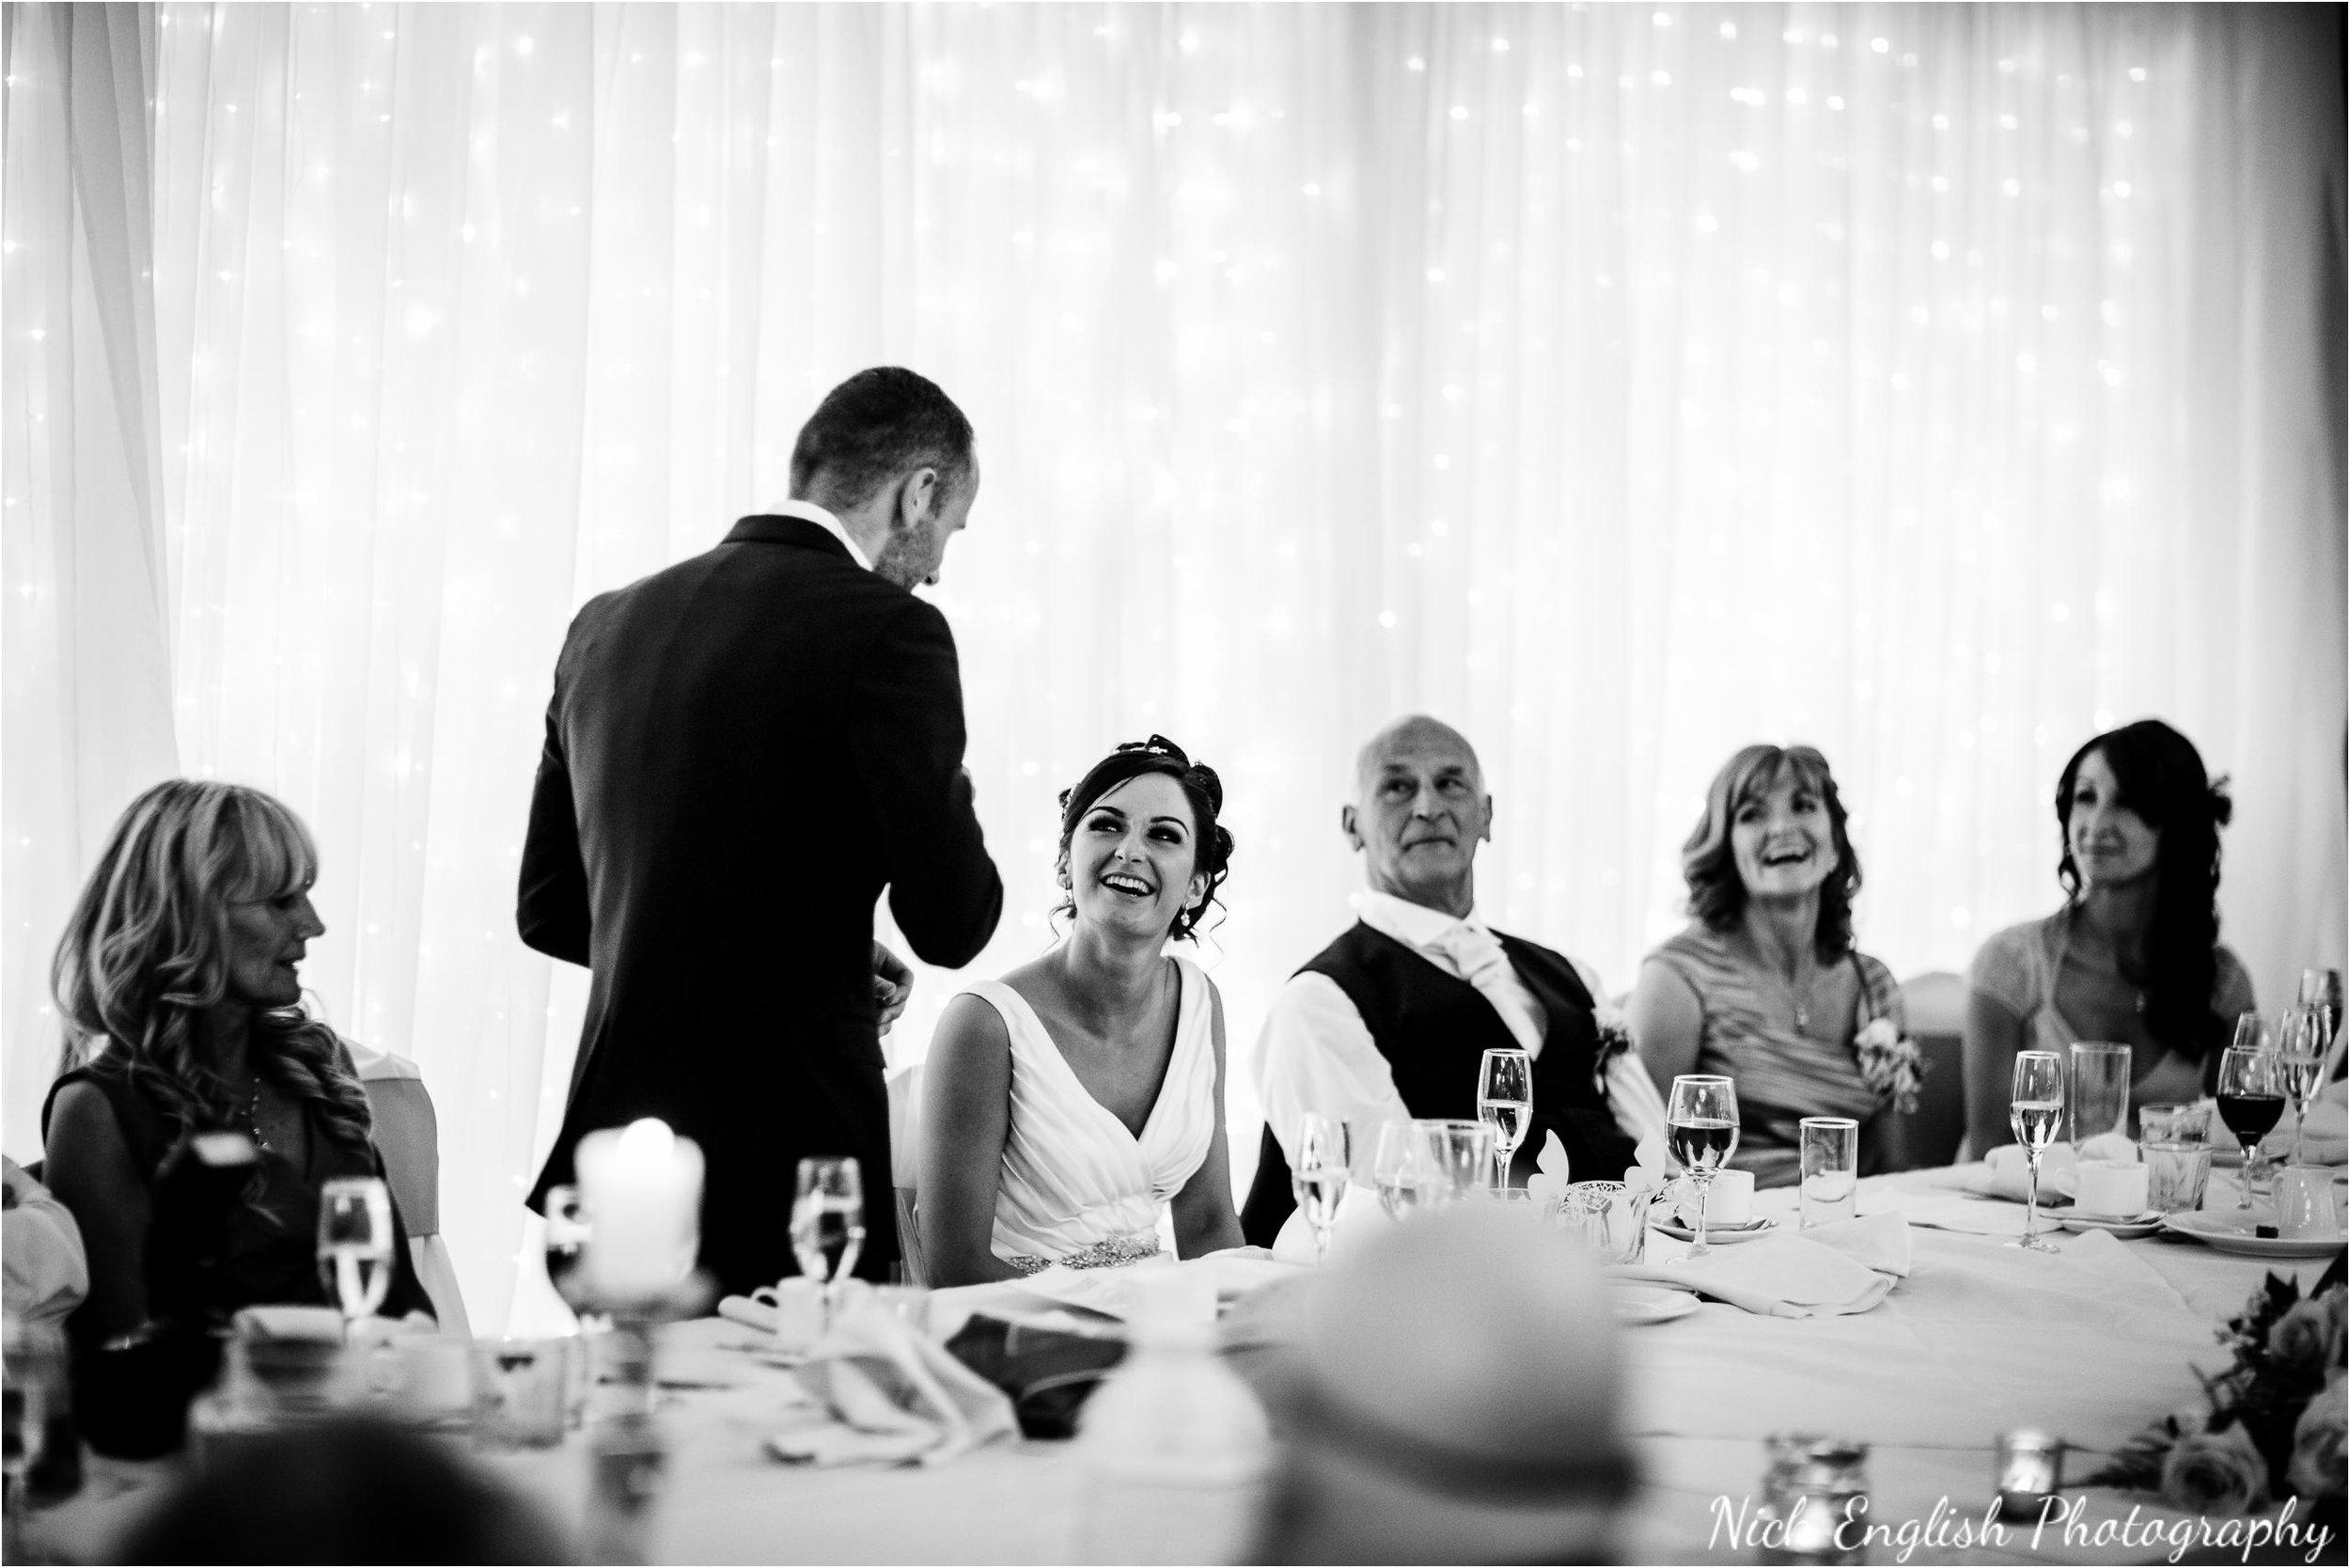 Emily David Wedding Photographs at Barton Grange Preston by Nick English Photography 176jpg.jpeg